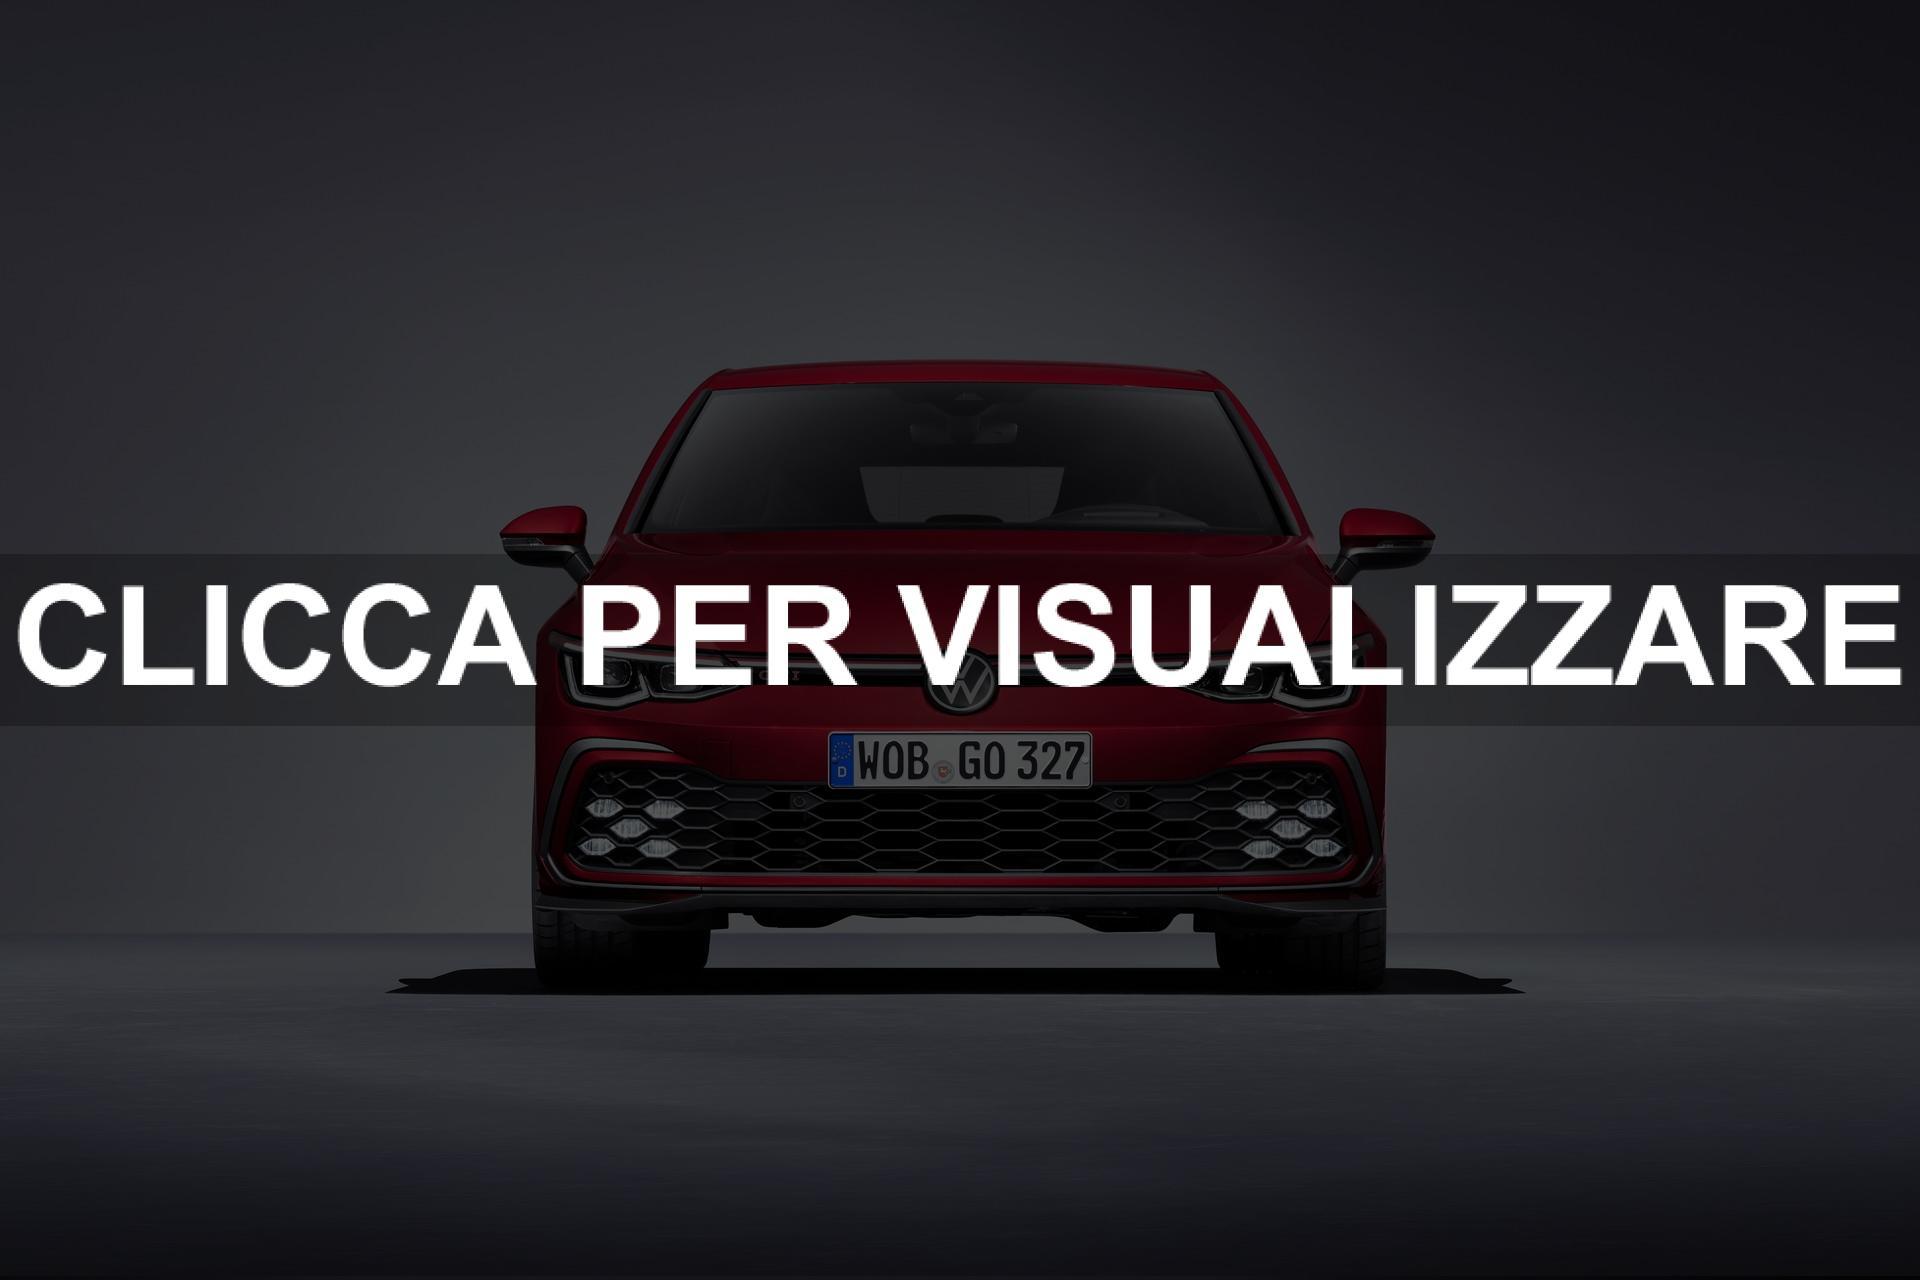 Immagine frontale nuova Volkswagen Golf 8 GTI 2020